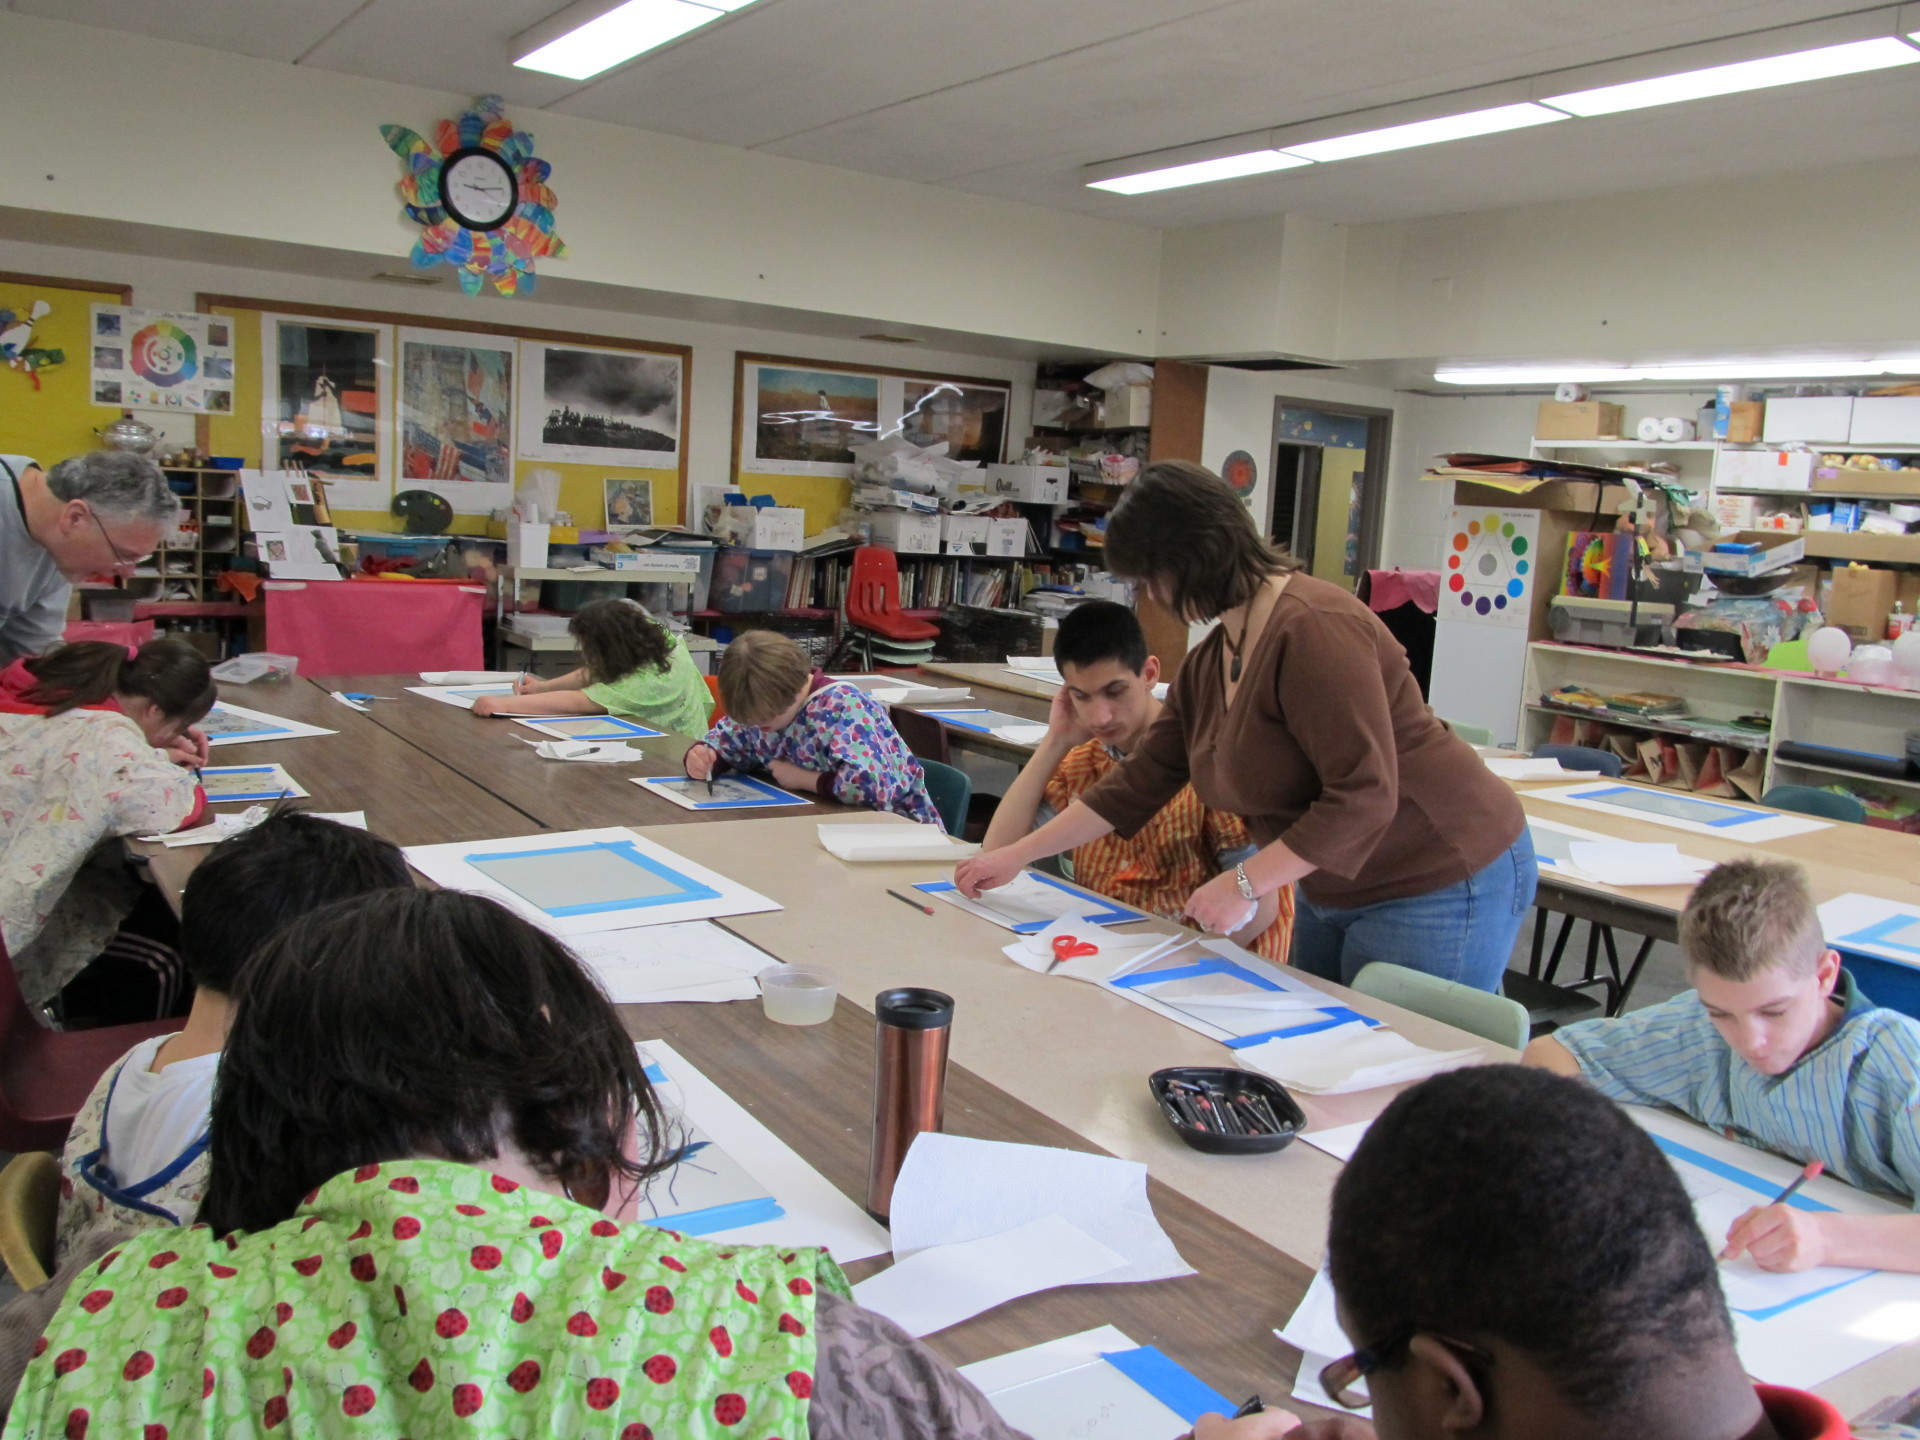 Art class at St Coletta Day School